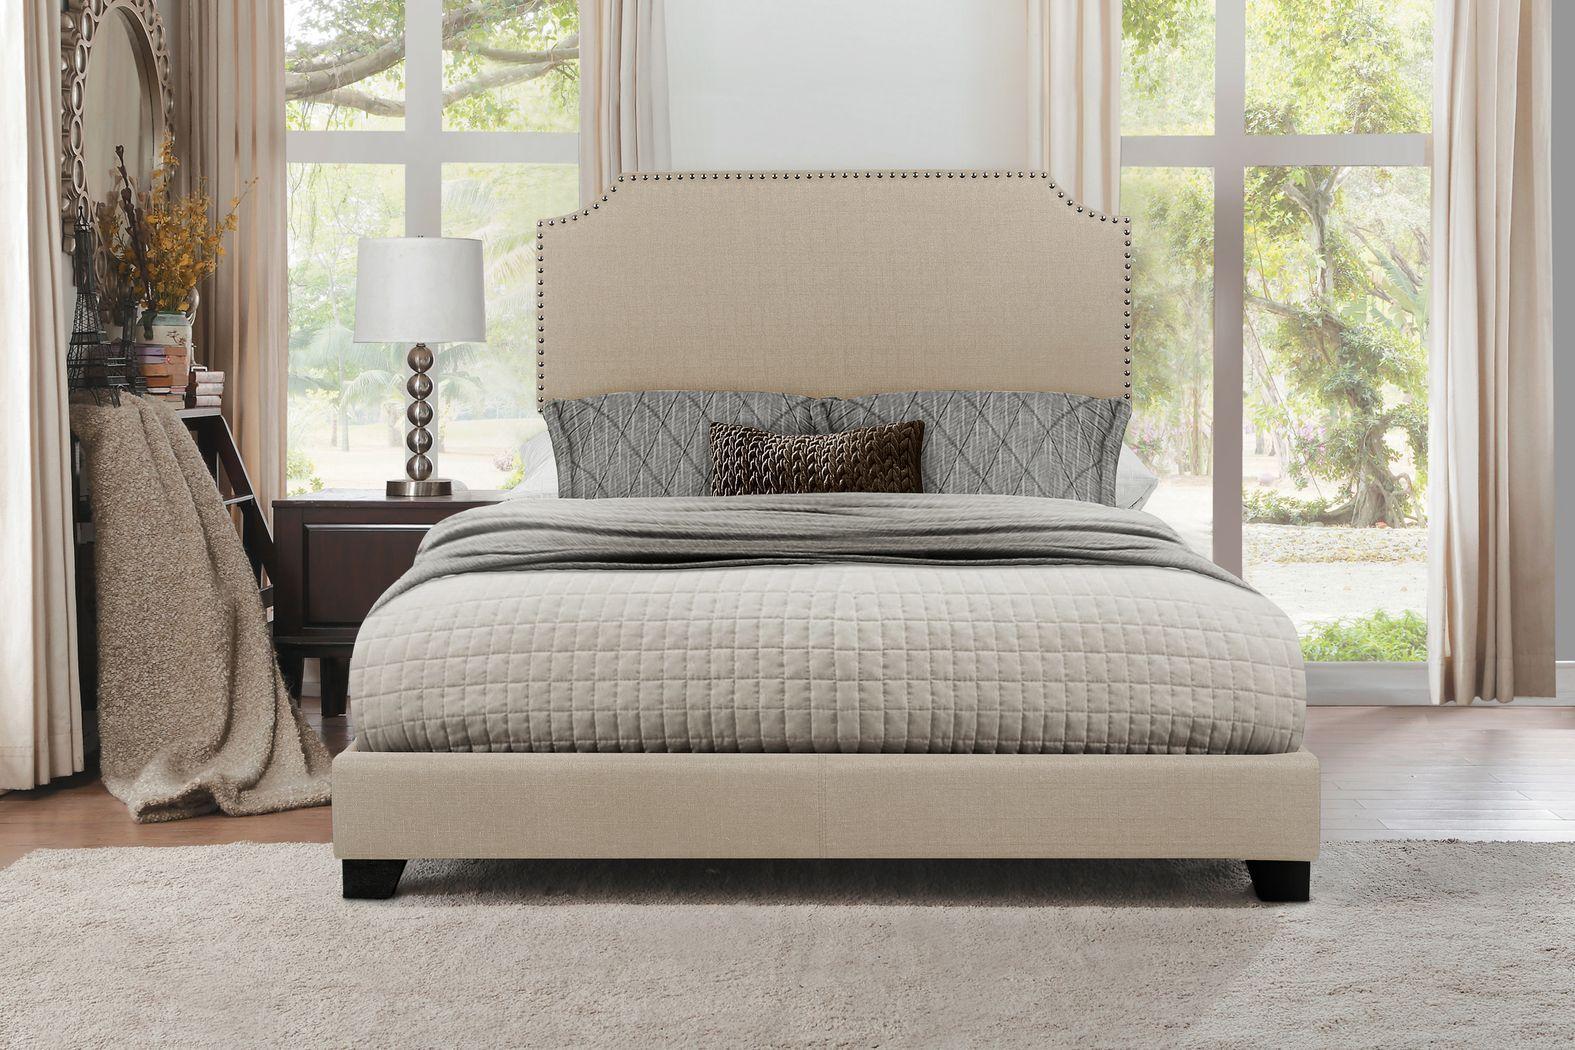 Carshalton Beige Queen Upholstered Bed Upholstered Beds Bed